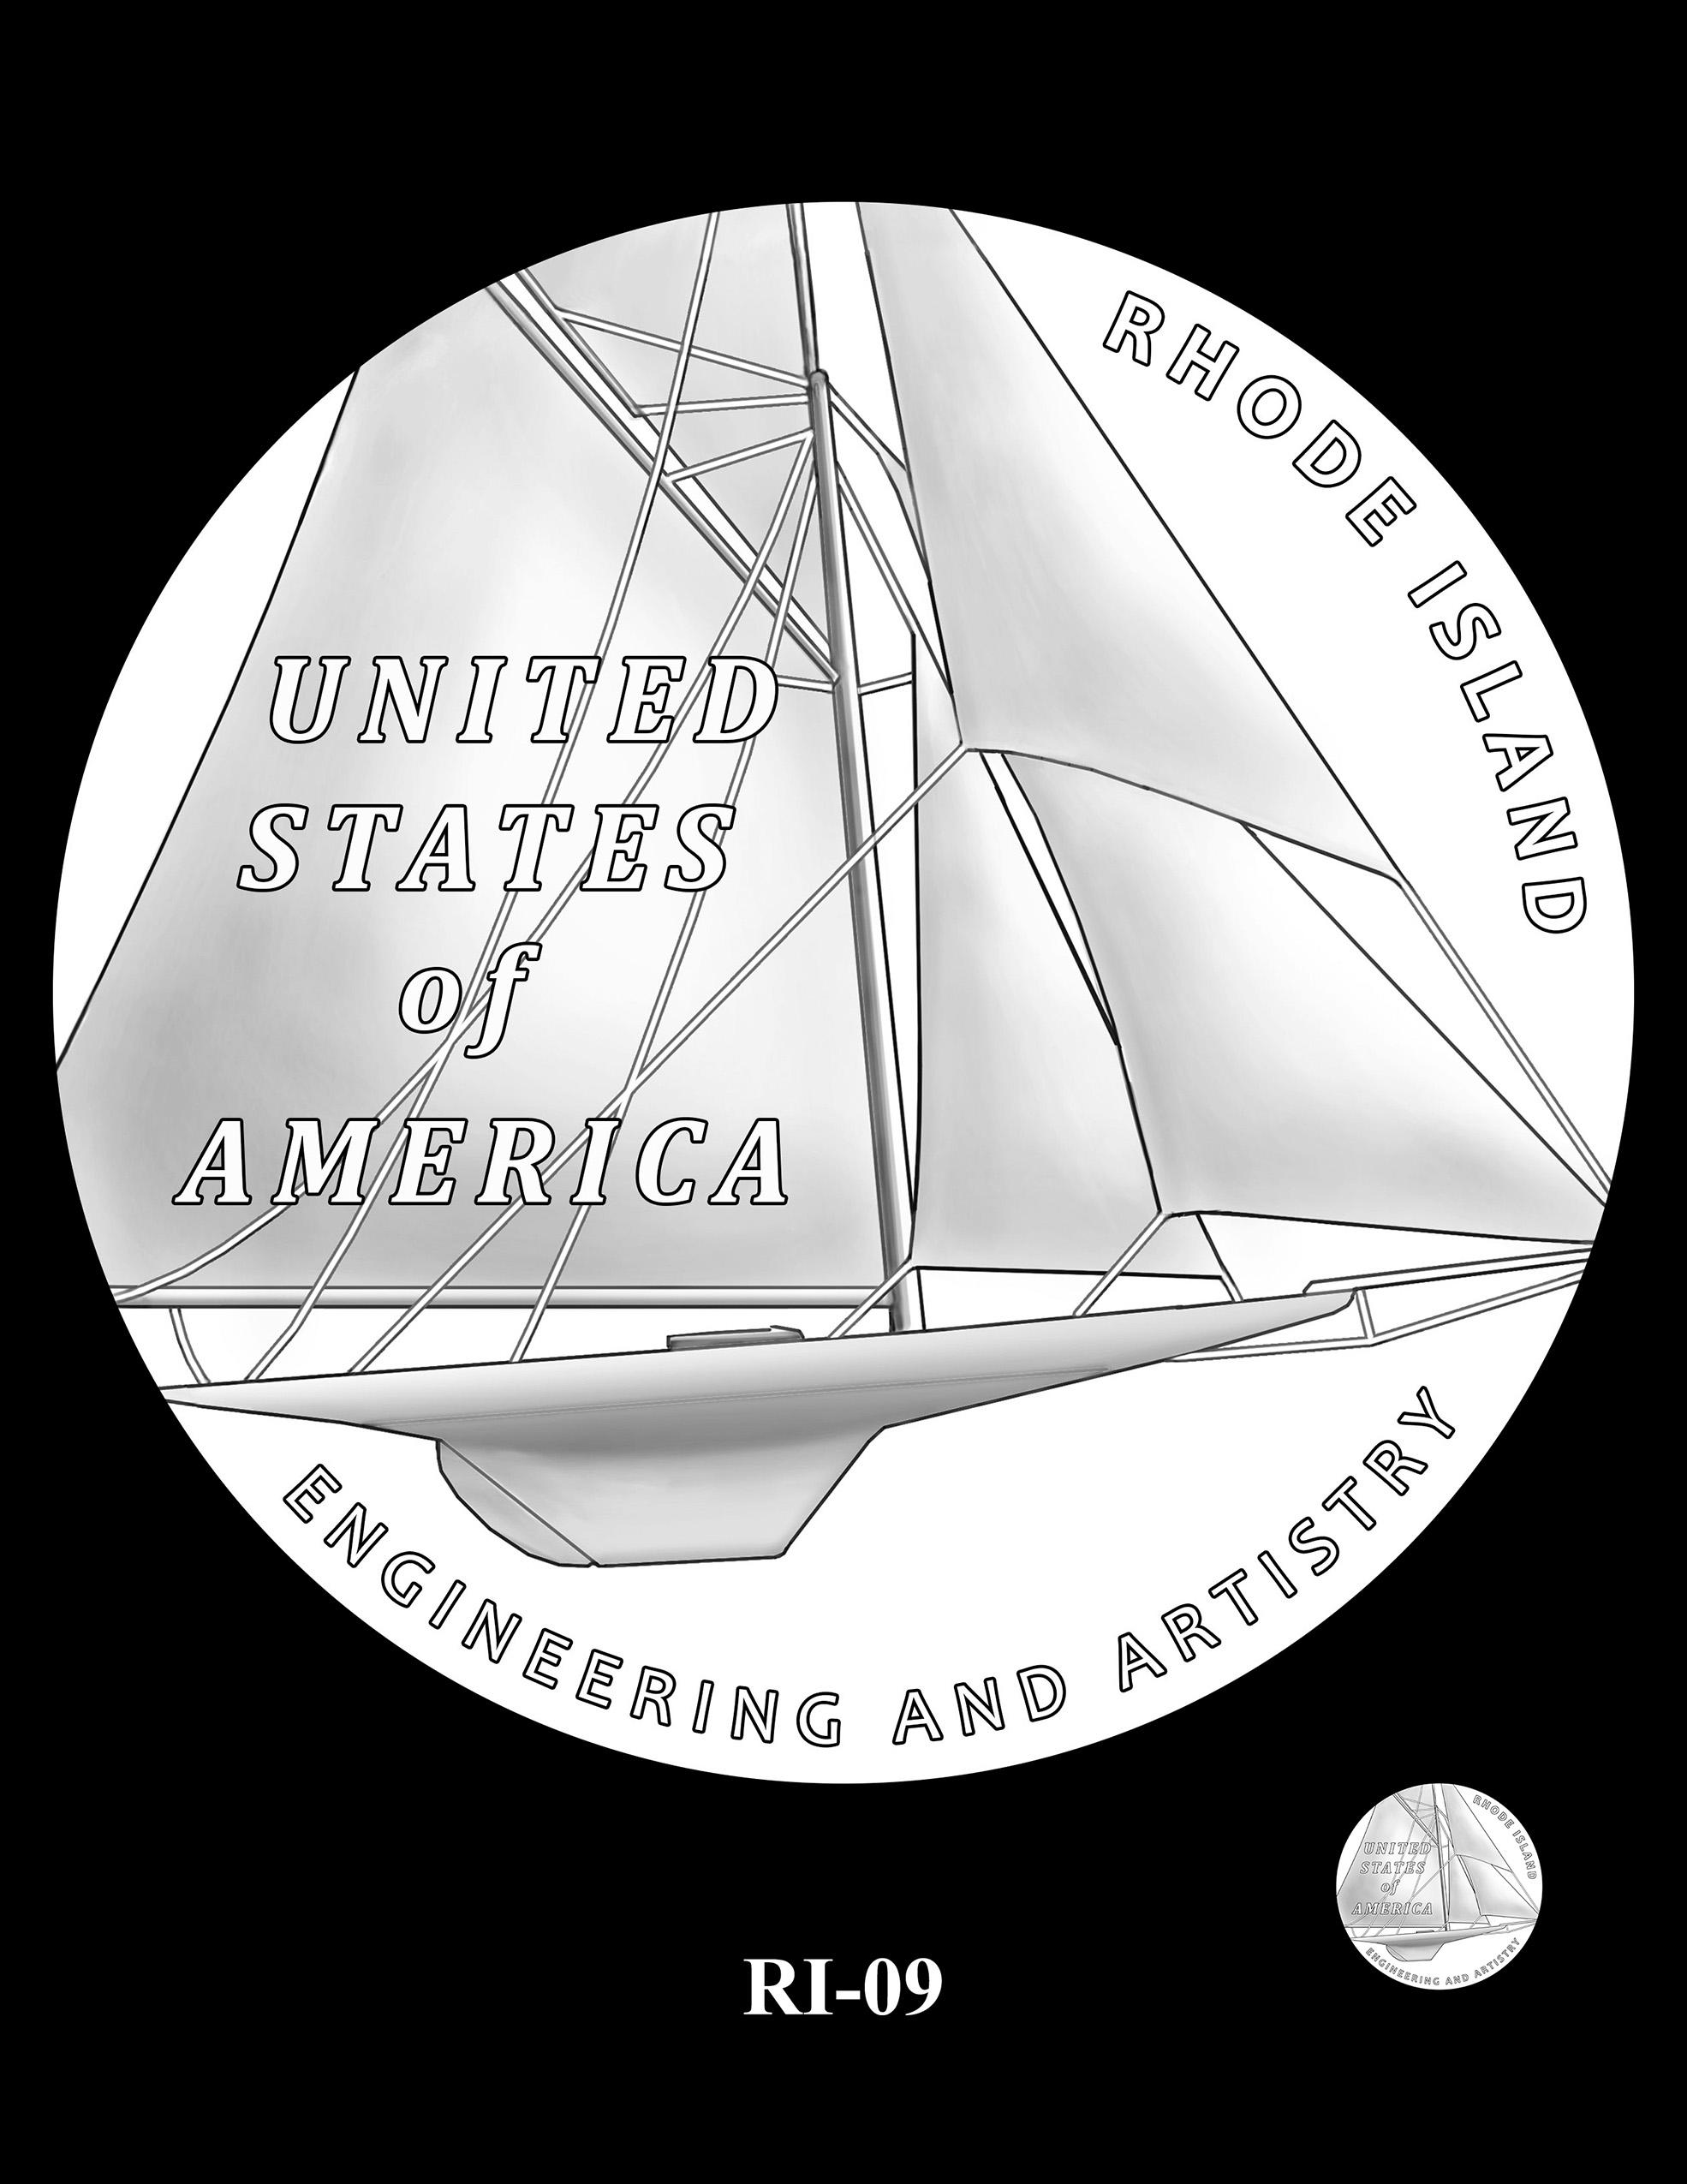 RI-09 -- 2022 American Innovation $1 Coin - Rhode Island